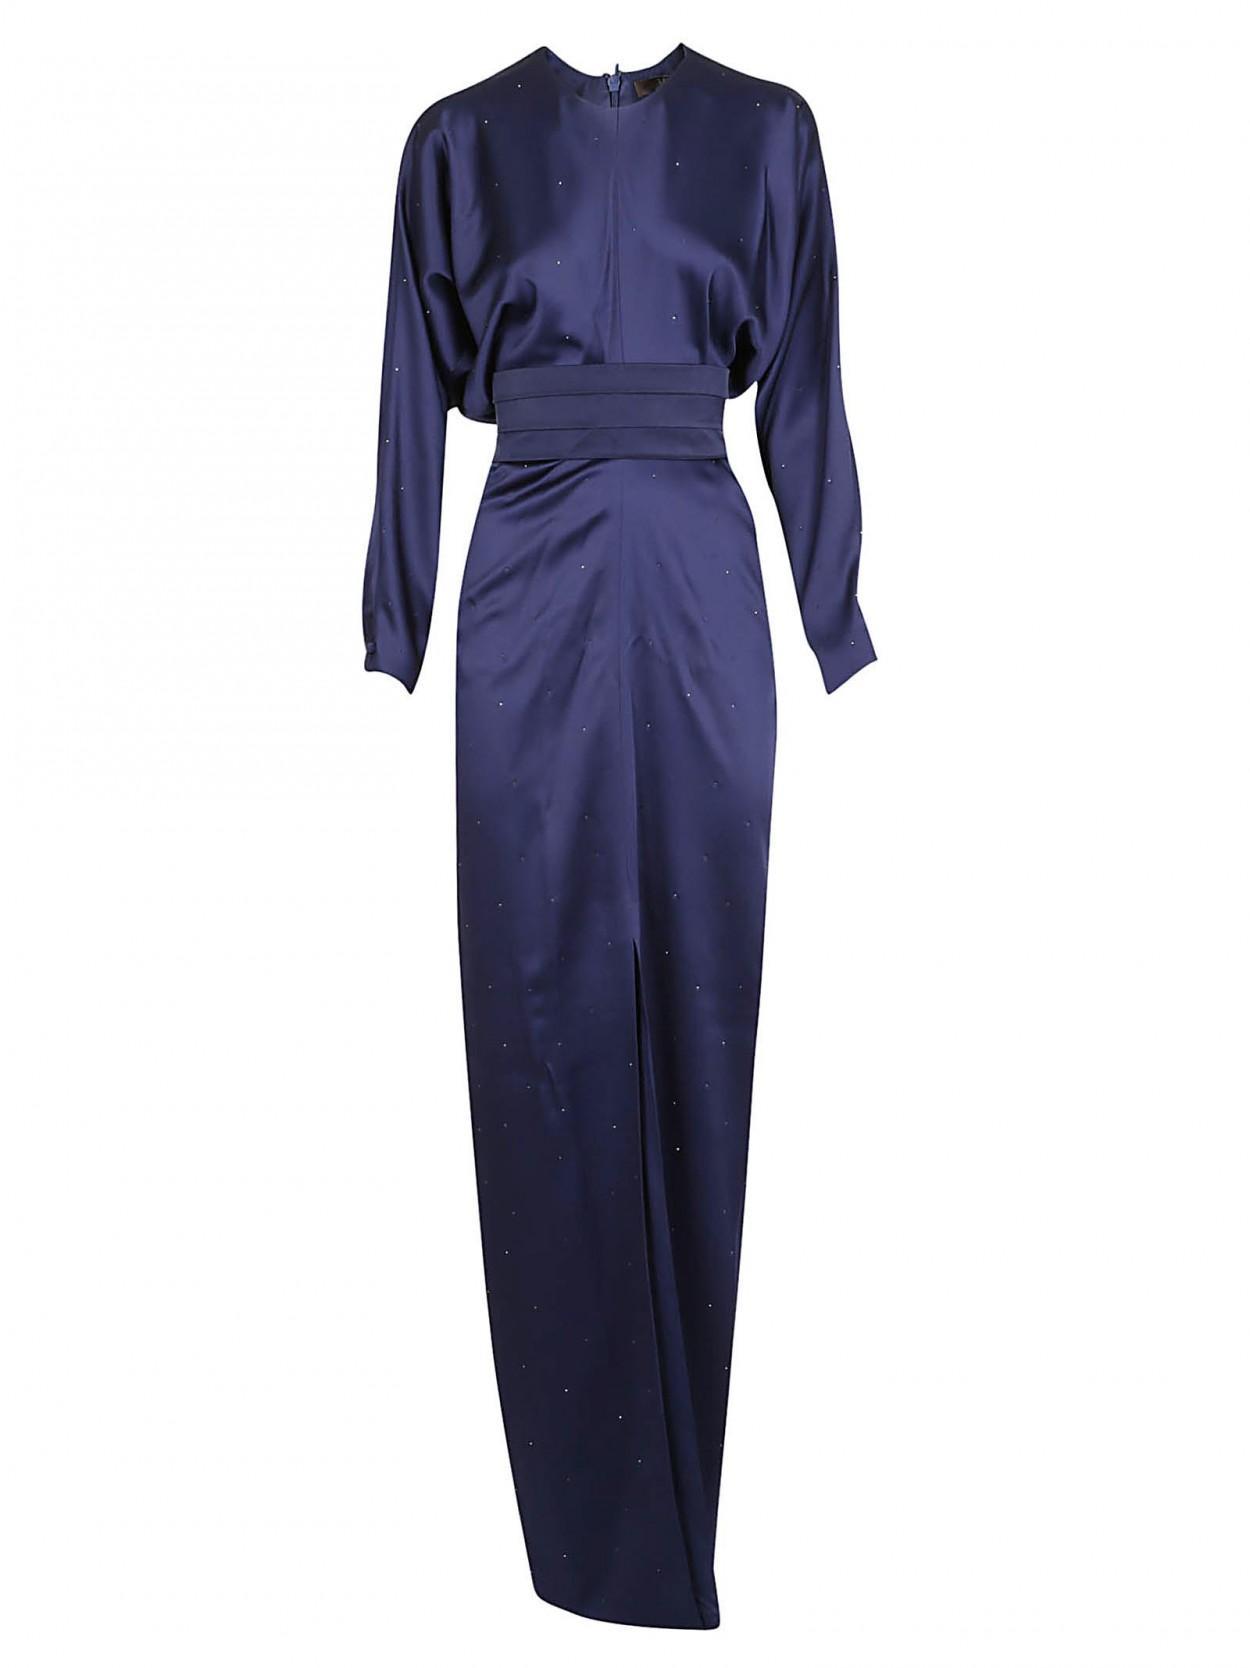 5d5021d707b1 Max Mara Elegante. Women's Blue MAX MARA ELEGANTE abito lungo blu notte  svarowski